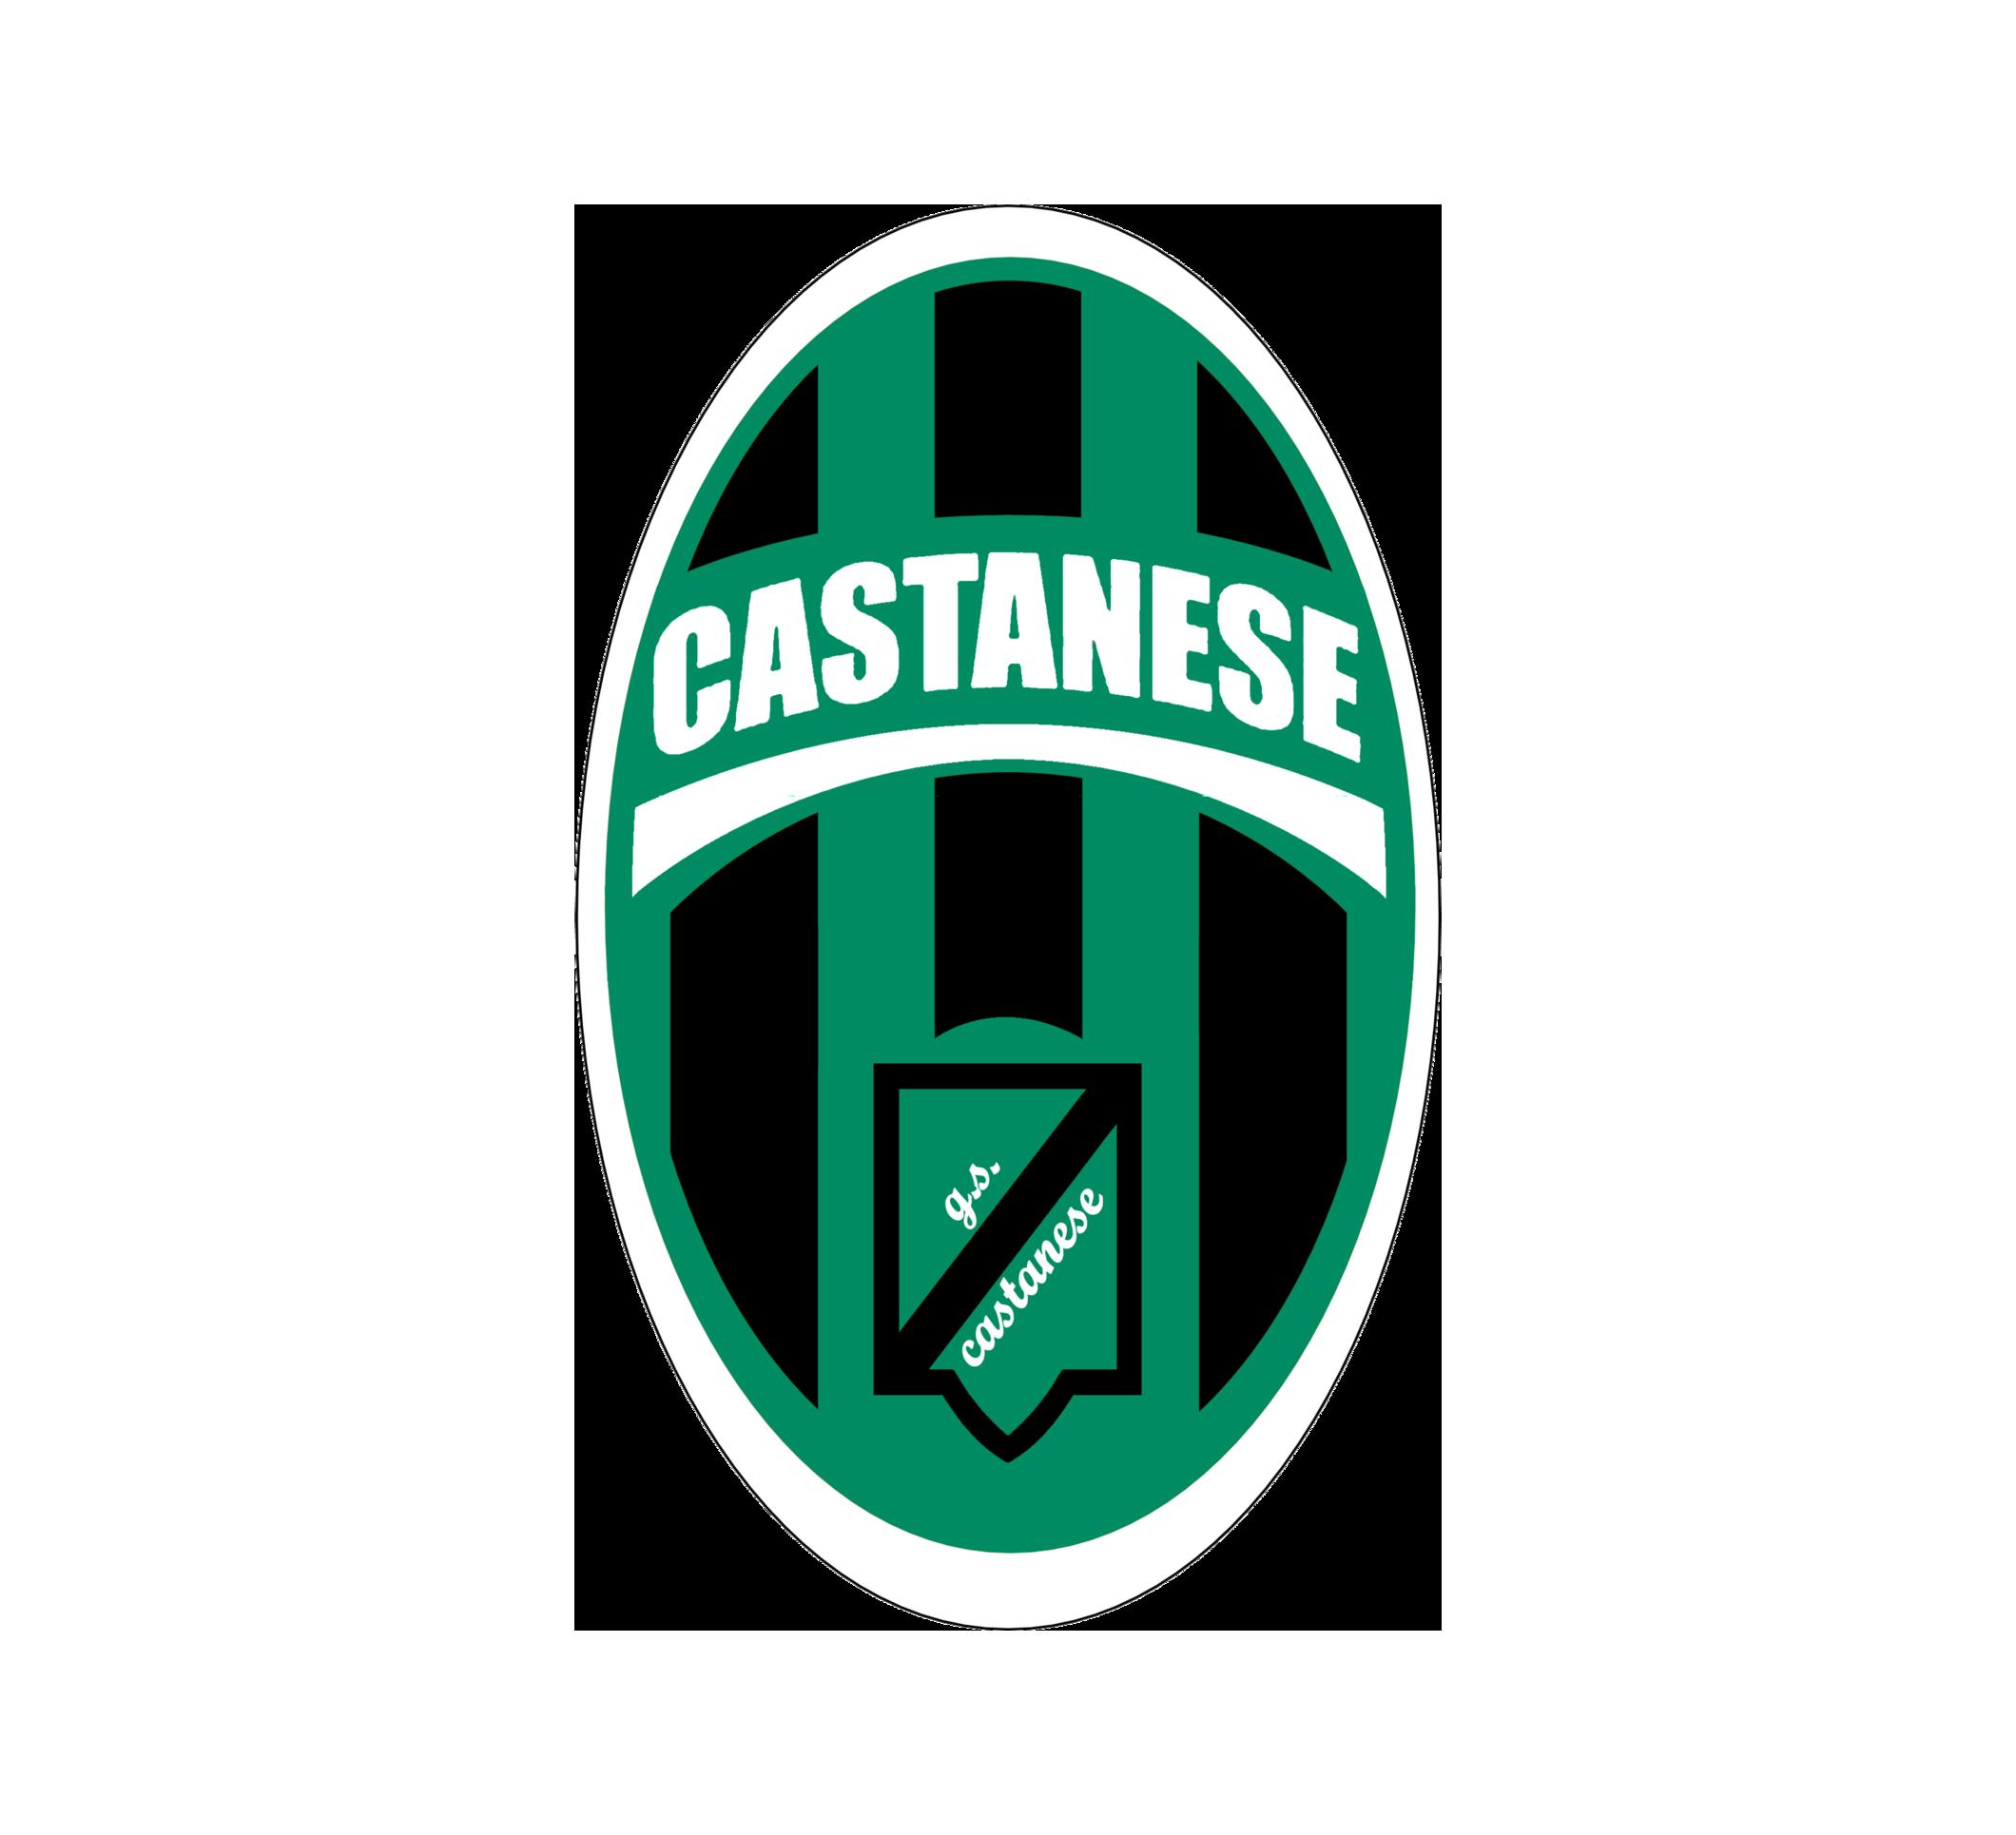 G.S. Castanese